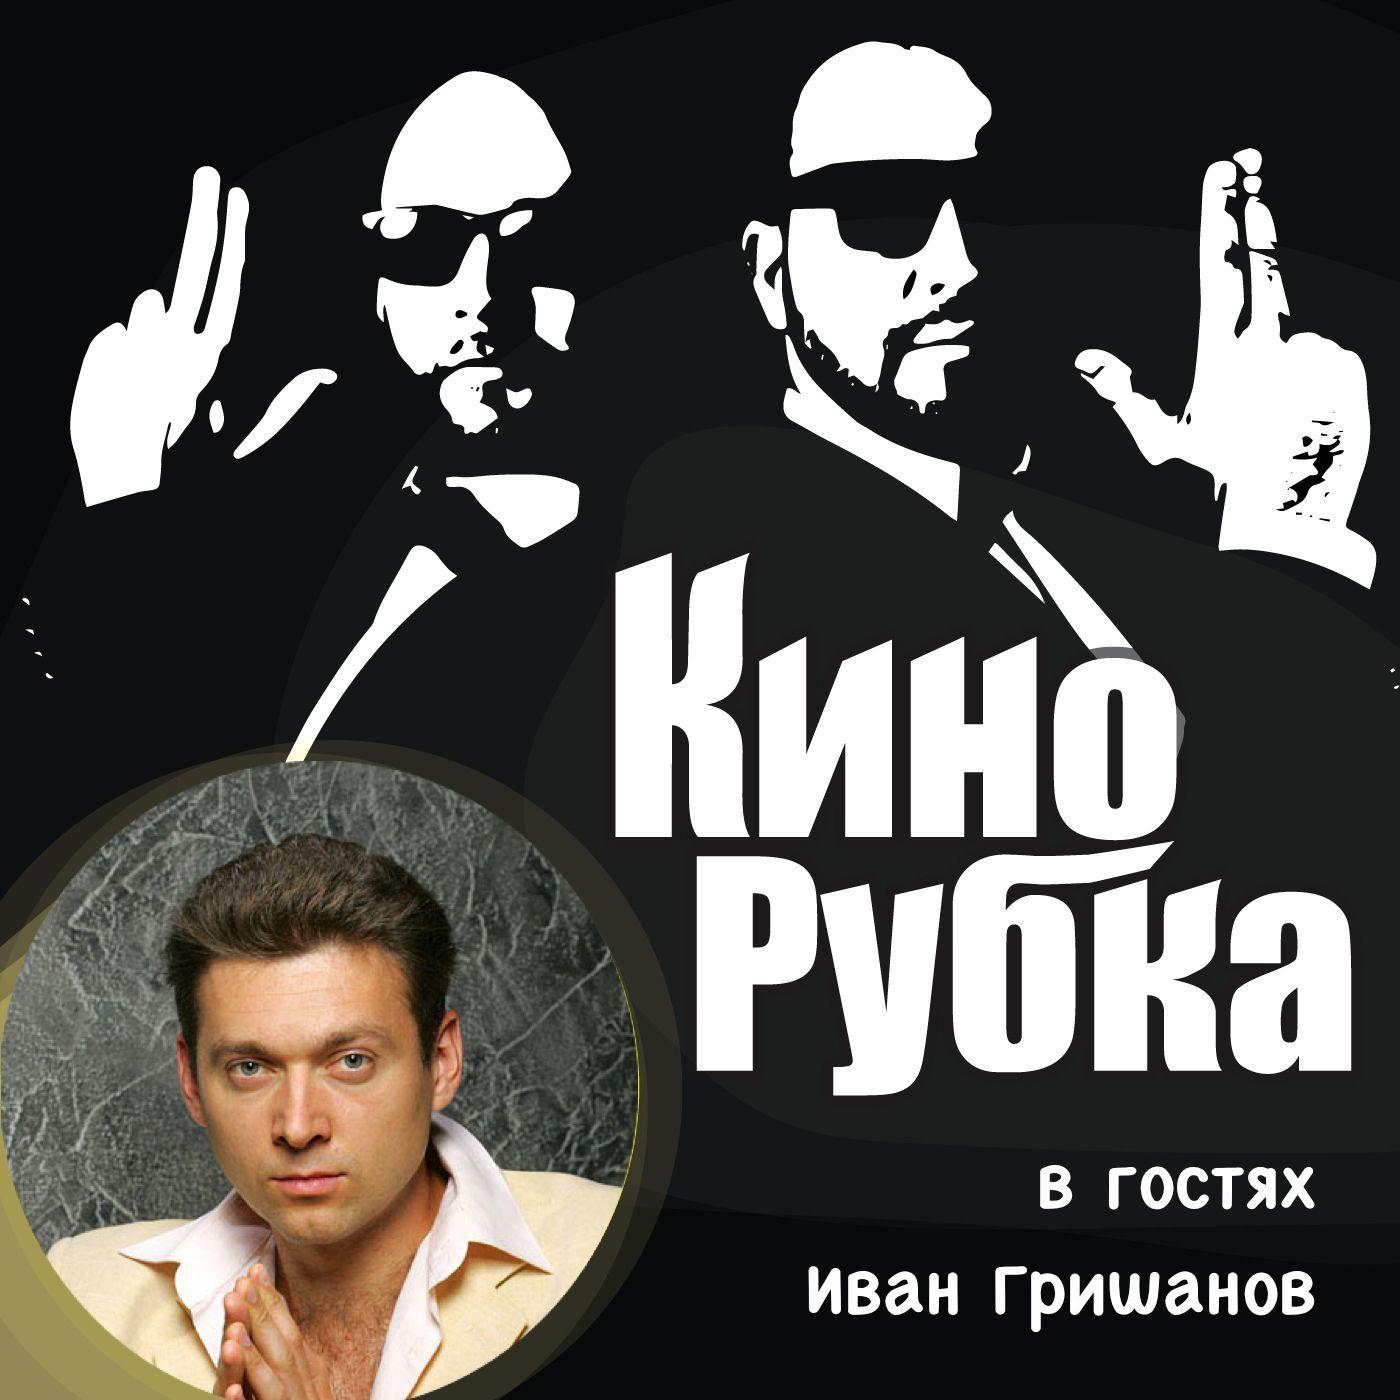 Павел Дикан Актер театра и кино Иван Гришанов павел дикан актер театра и кино николай цонку